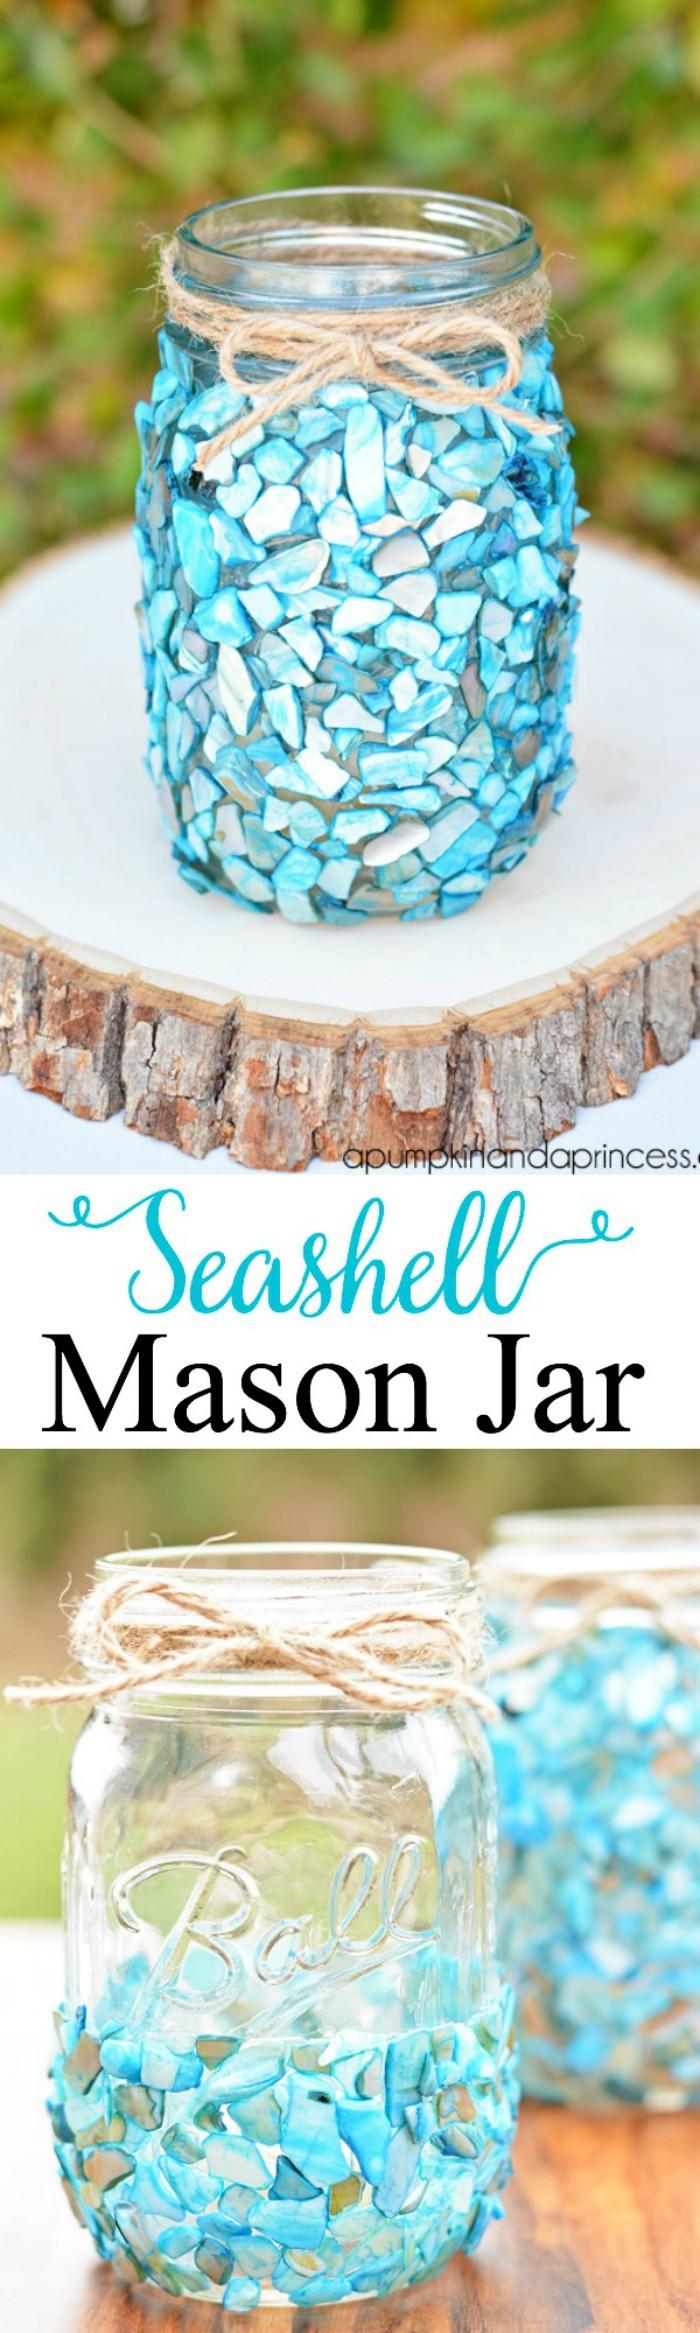 DIY Seashell Mason Jar DIY Home Decor Projects To Make Your Home Cute